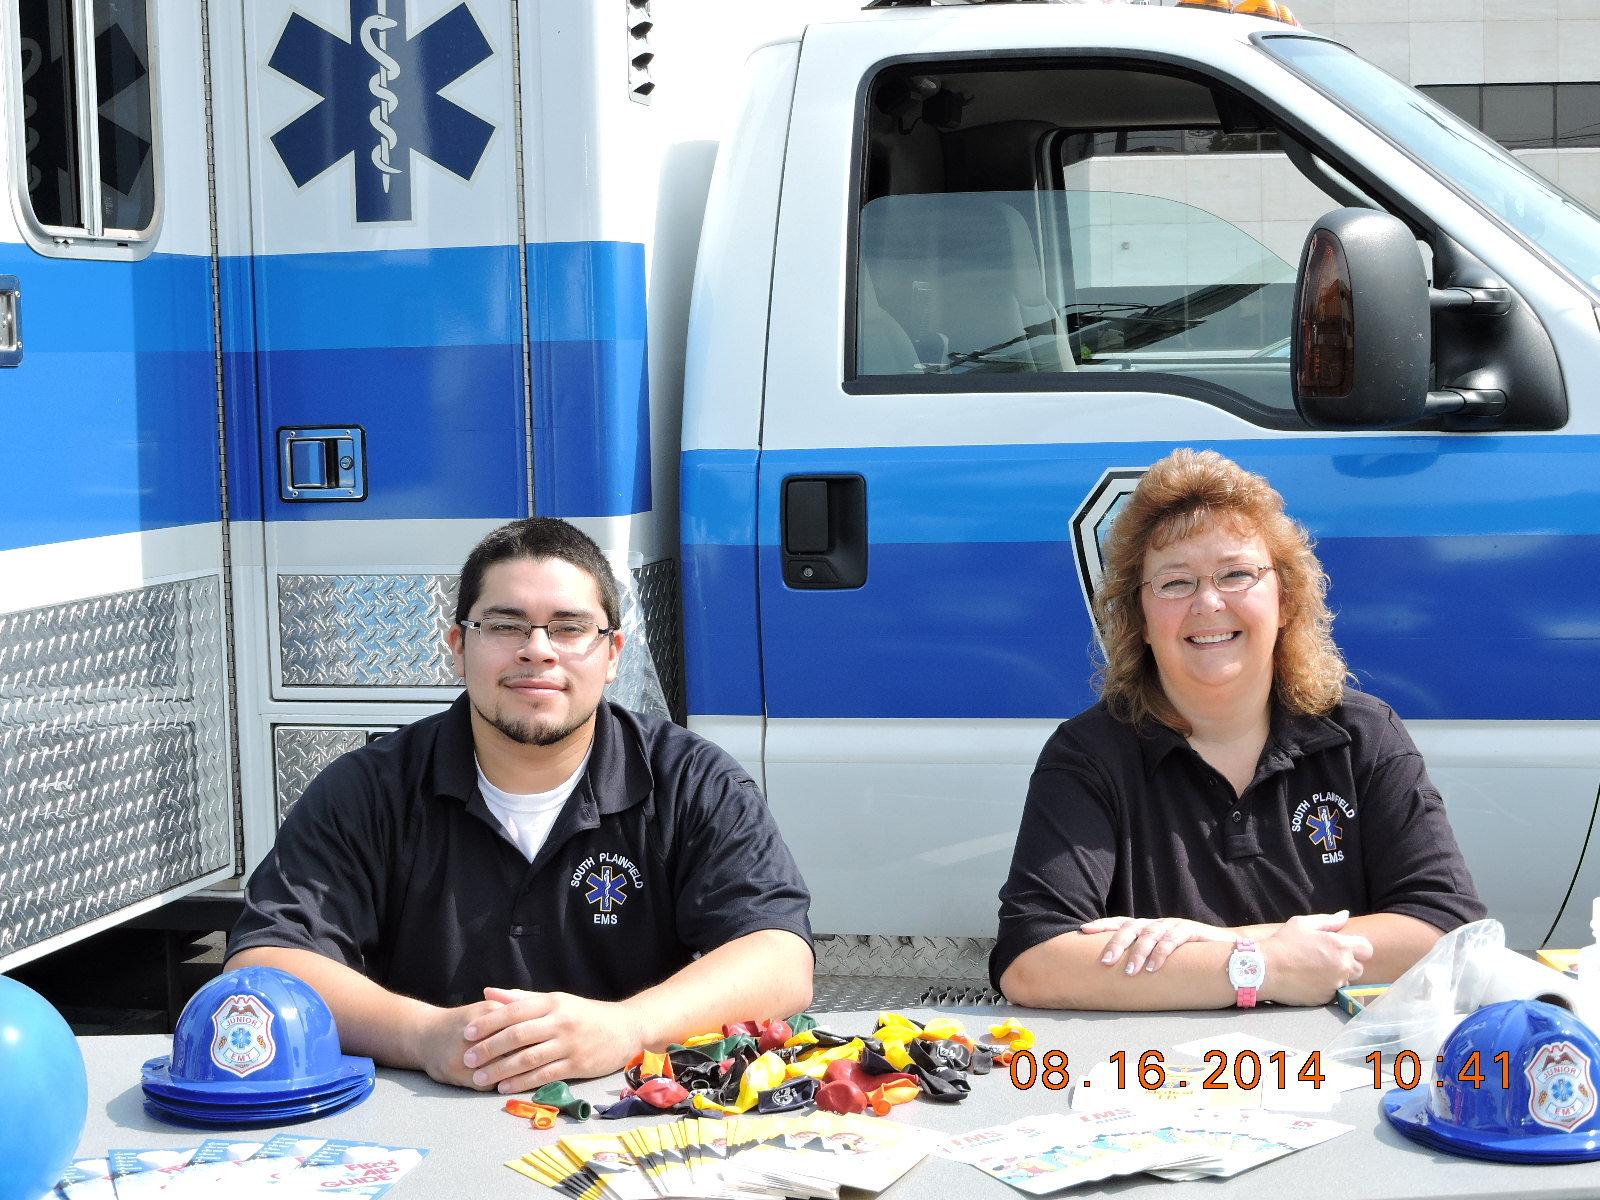 4d0f4707ef498d1ba39b_rescue.jpg